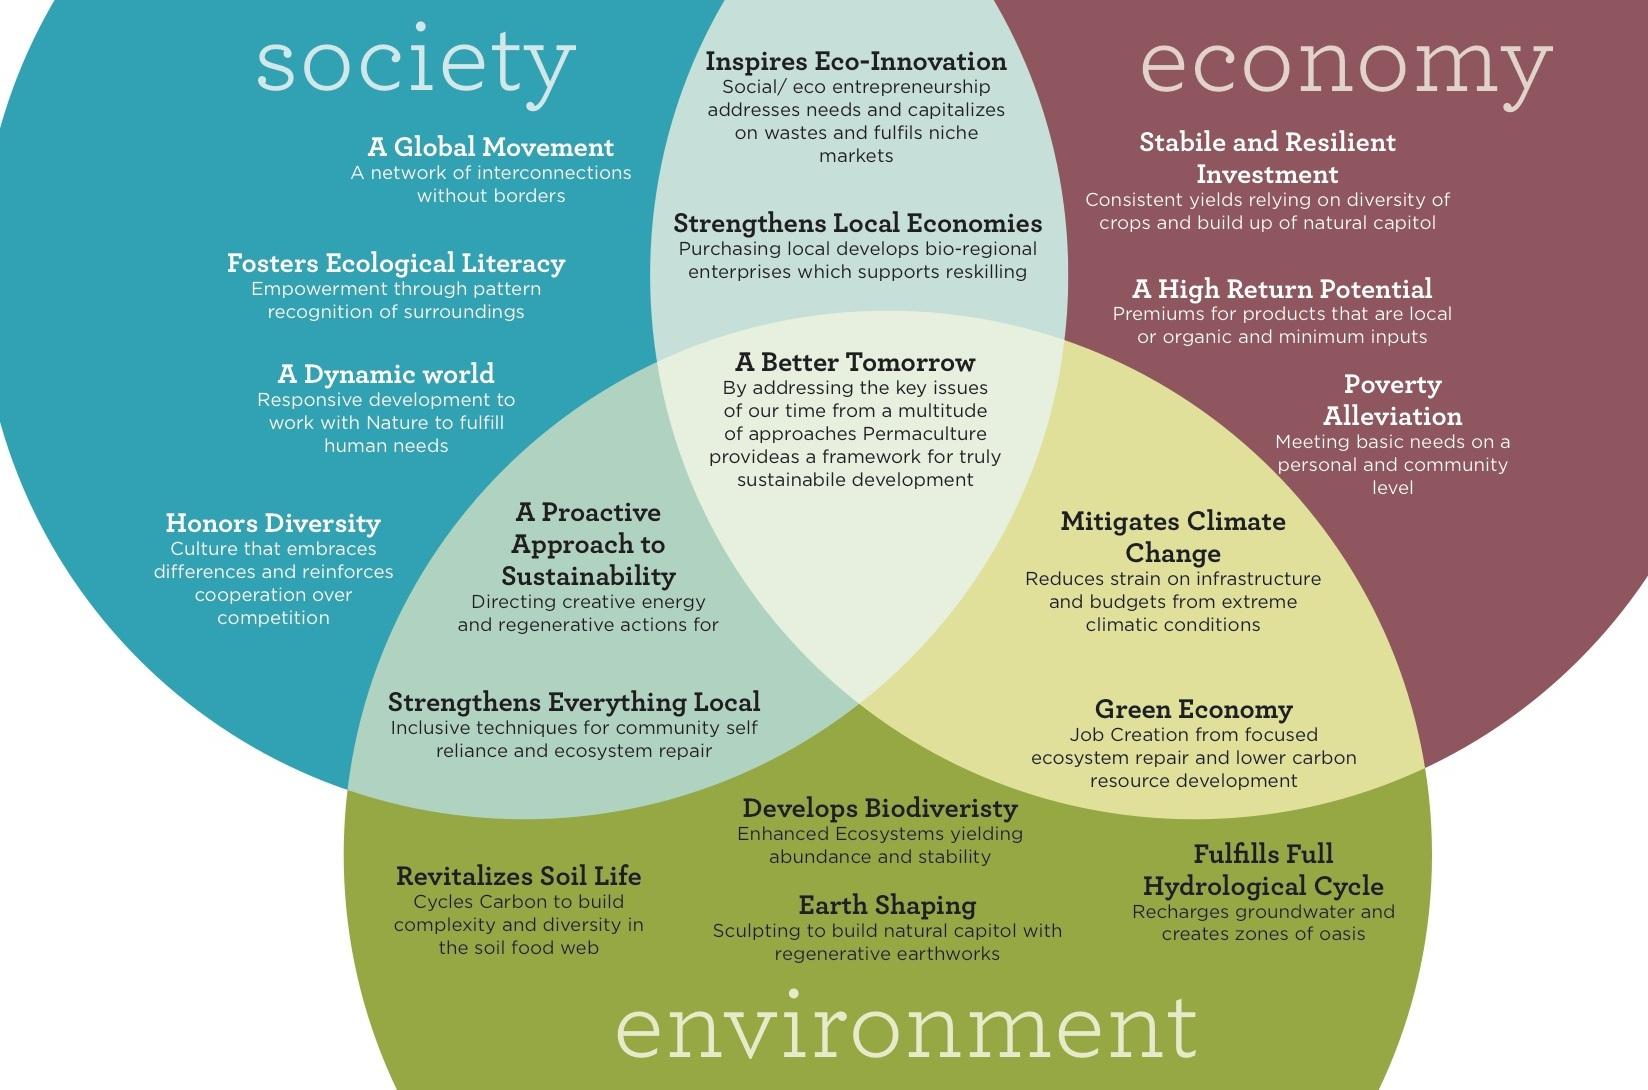 Image courtesy of treeyopermaculture.com